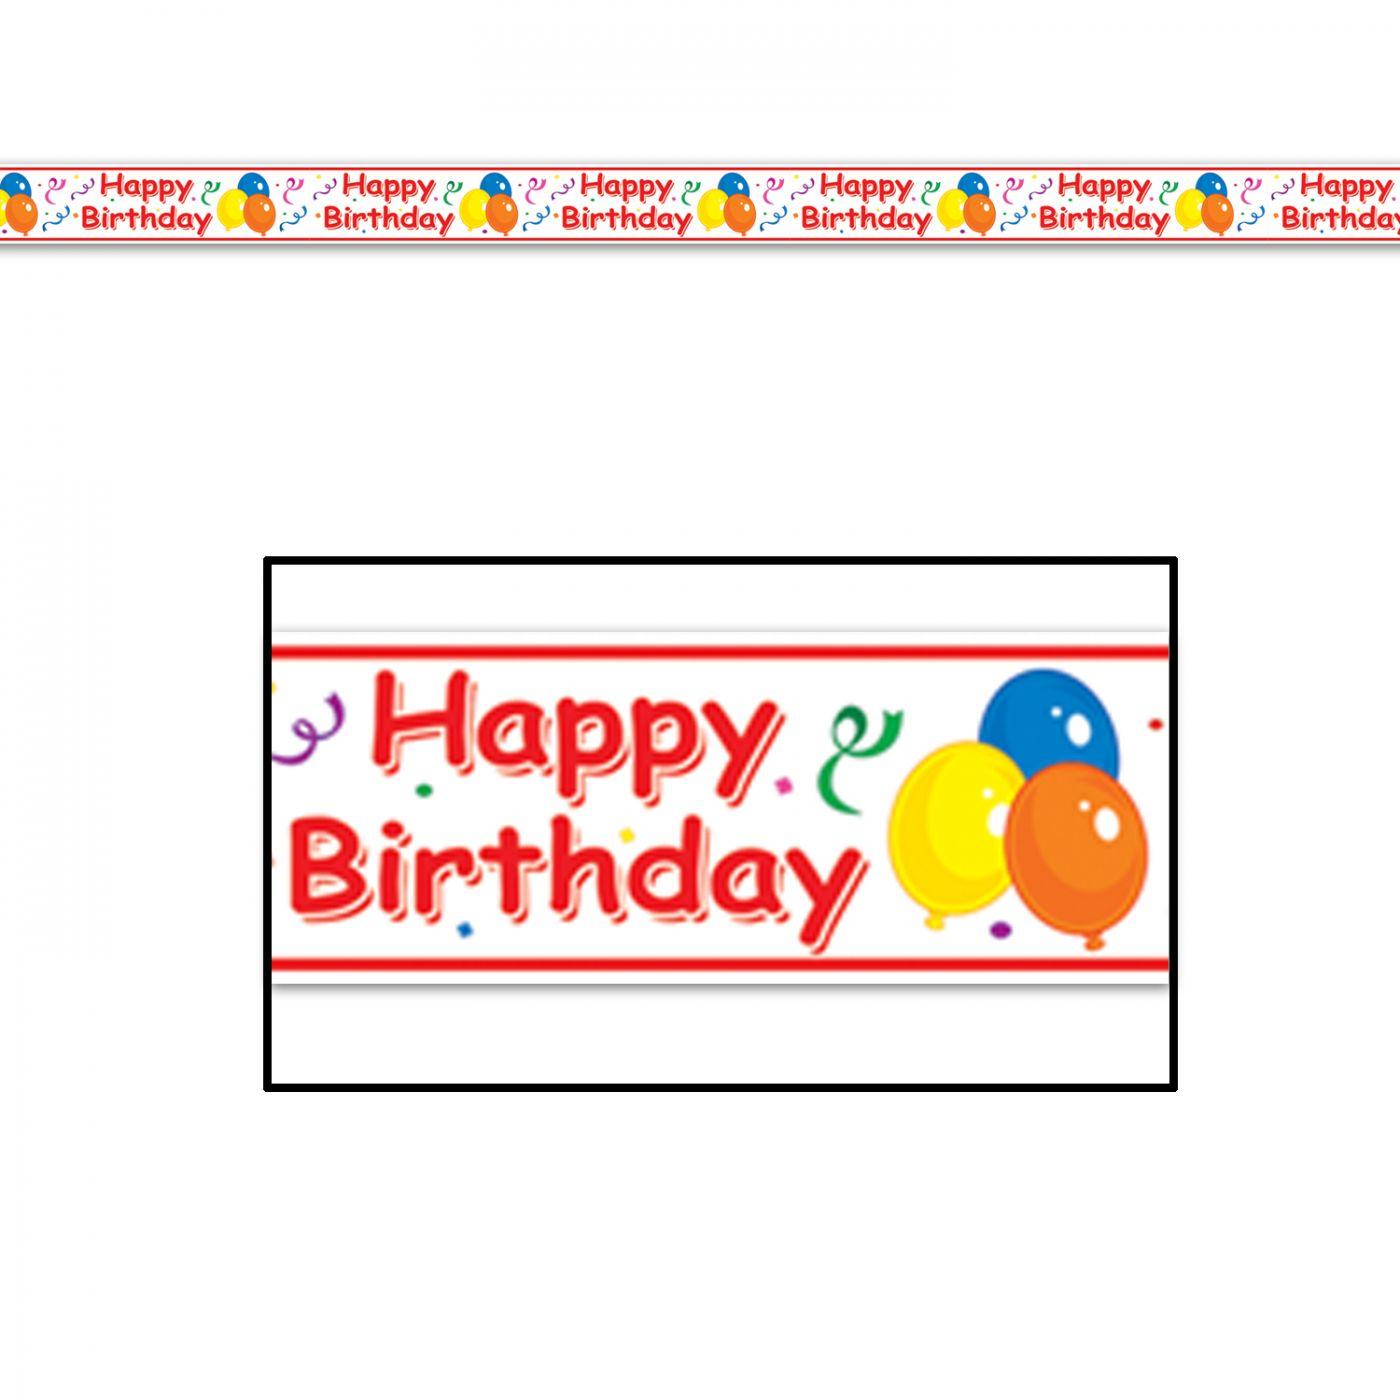 Happy Birthday Party Tape image